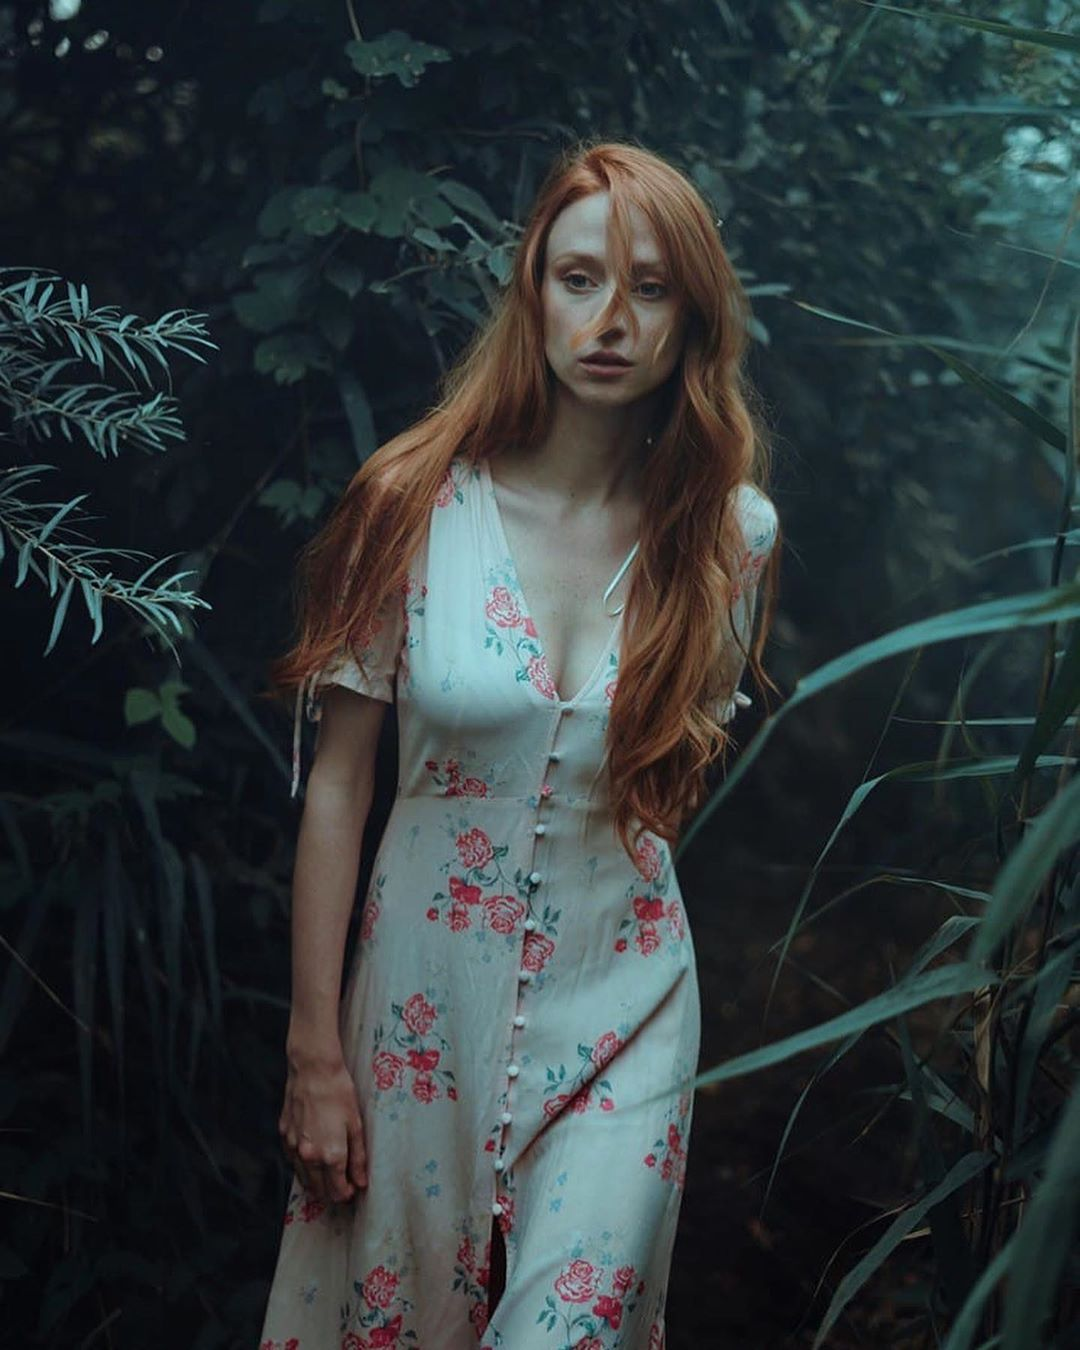 Alina Kovalenko On Instagram Got Goosebumps Watching This Katerinakozinskaya Beautiful Red Hair Beautiful Redhead Redhead Beauty